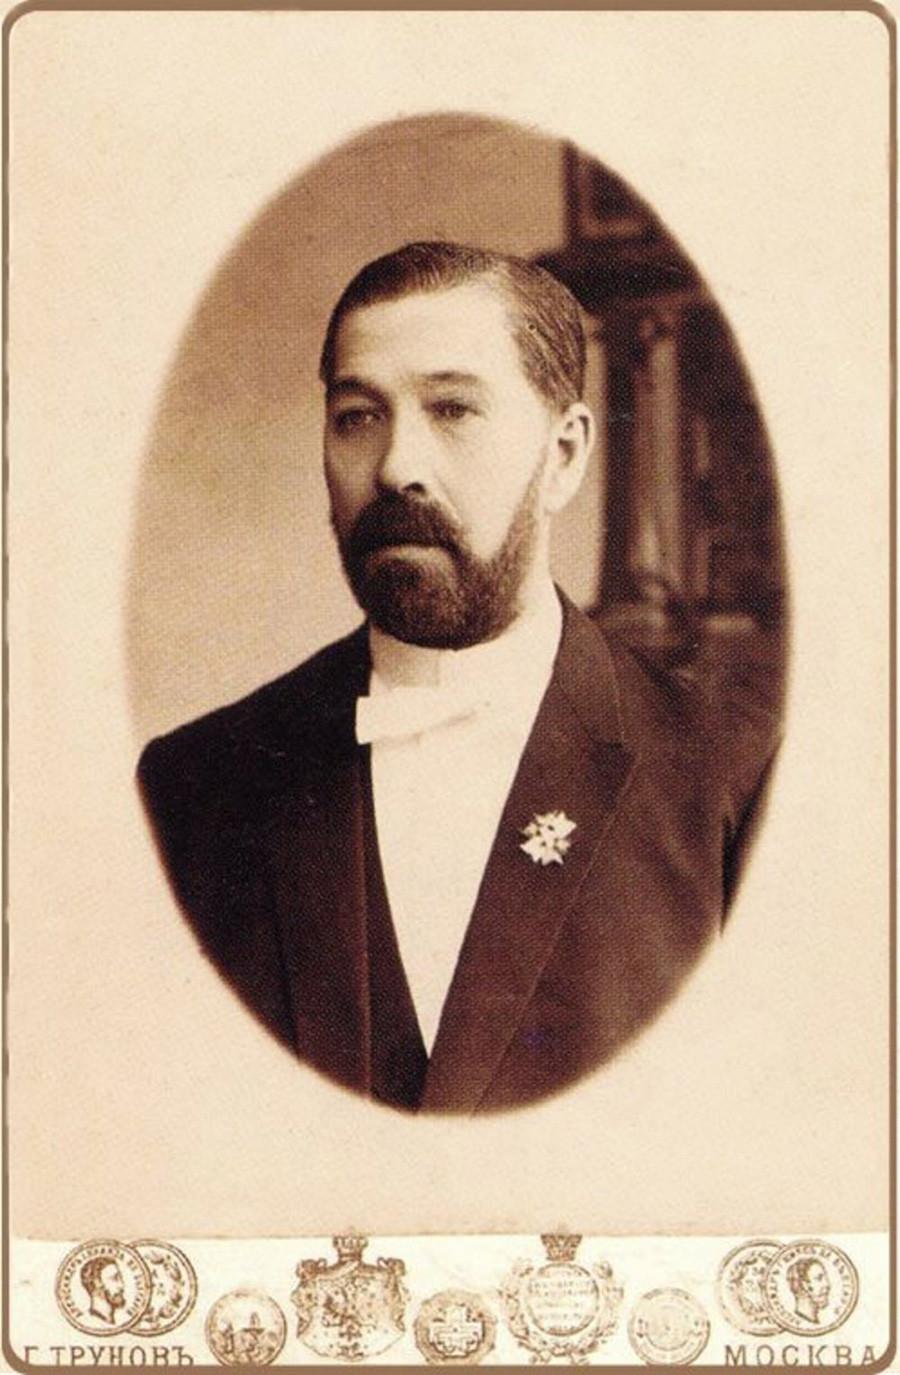 Pjotr Smirnow